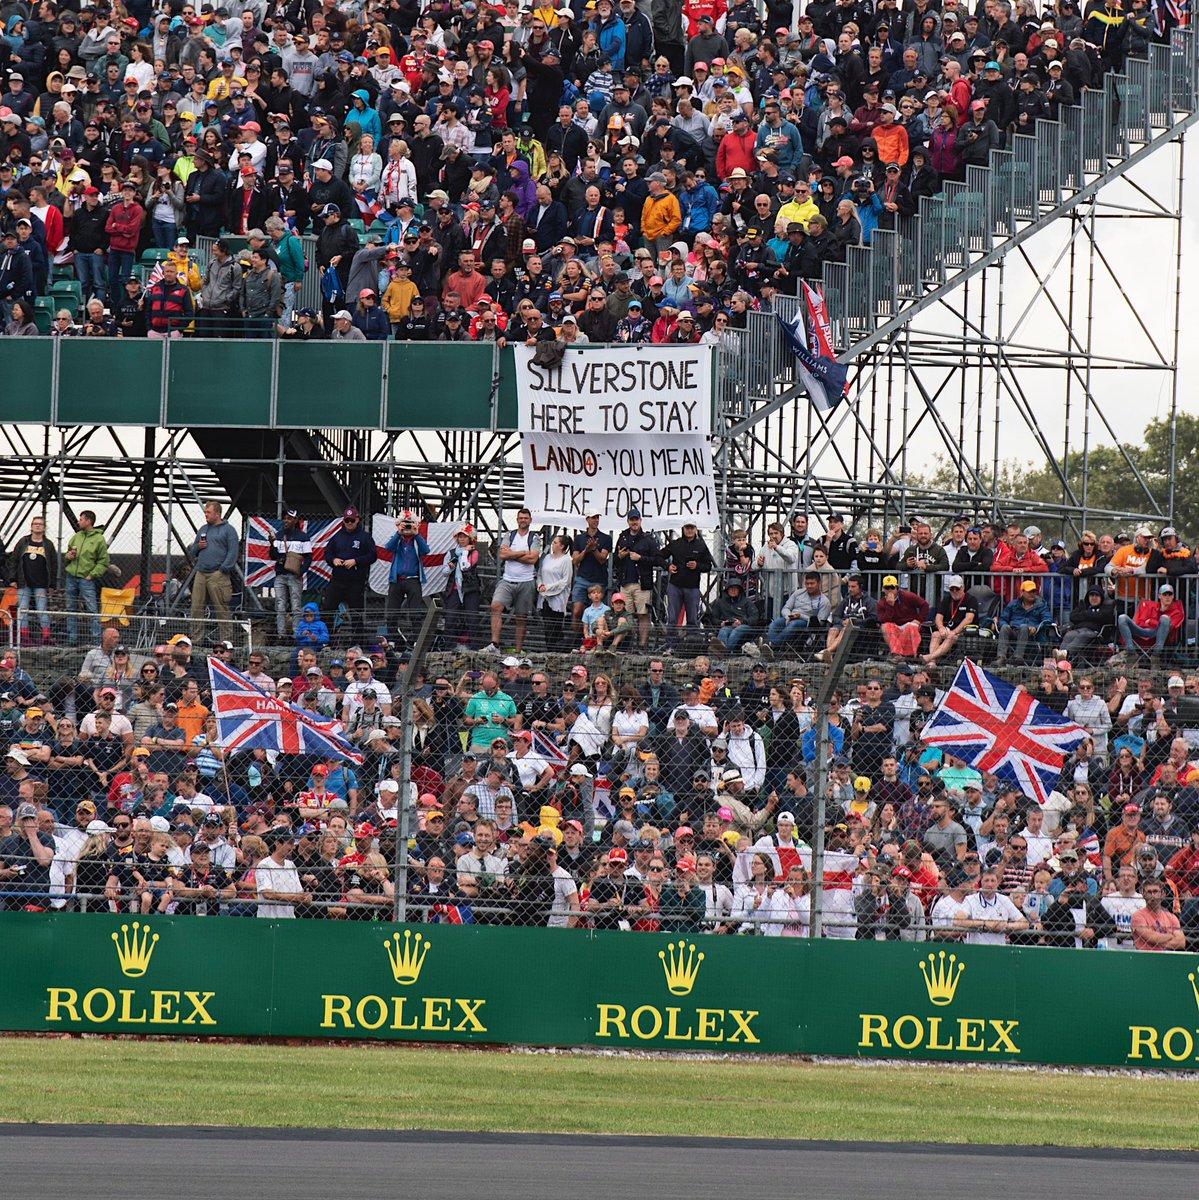 Hahaha @SilverstoneUK. It's good to keep ya' #BritishGP